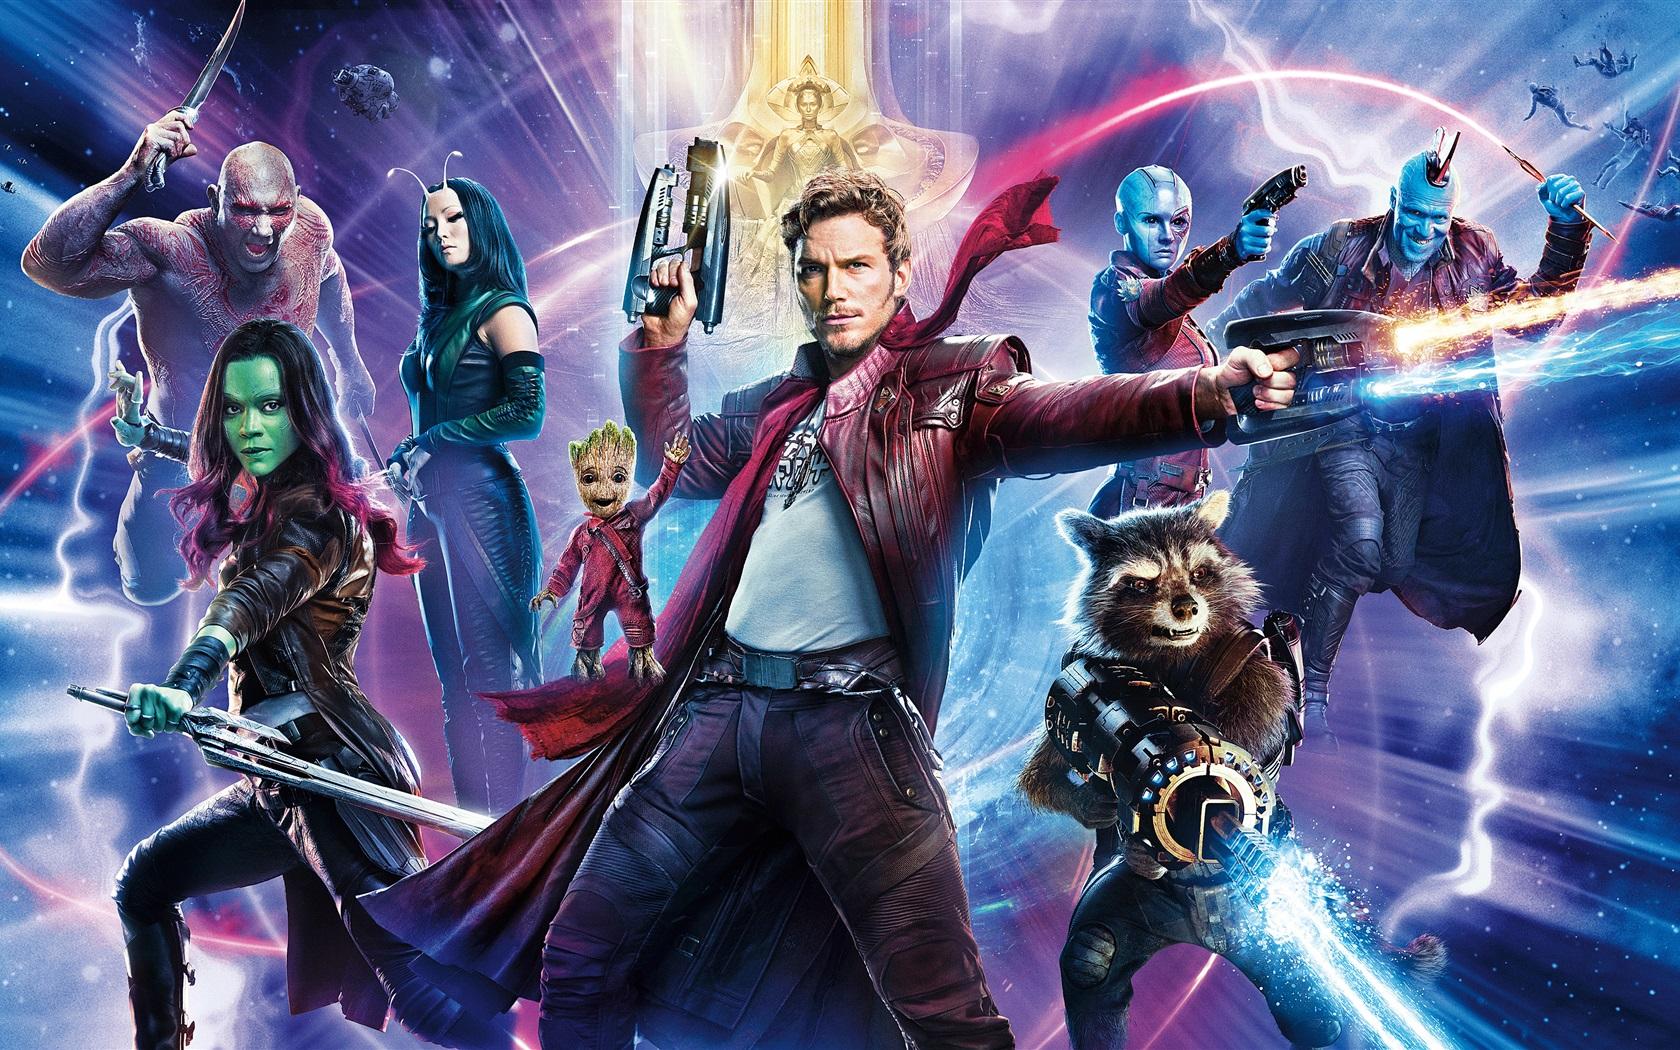 Guardians Of The Galaxy Vol 2 Wallpaper: 2017 Movie HD, Guardians Of The Galaxy Vol. 2 Wallpaper